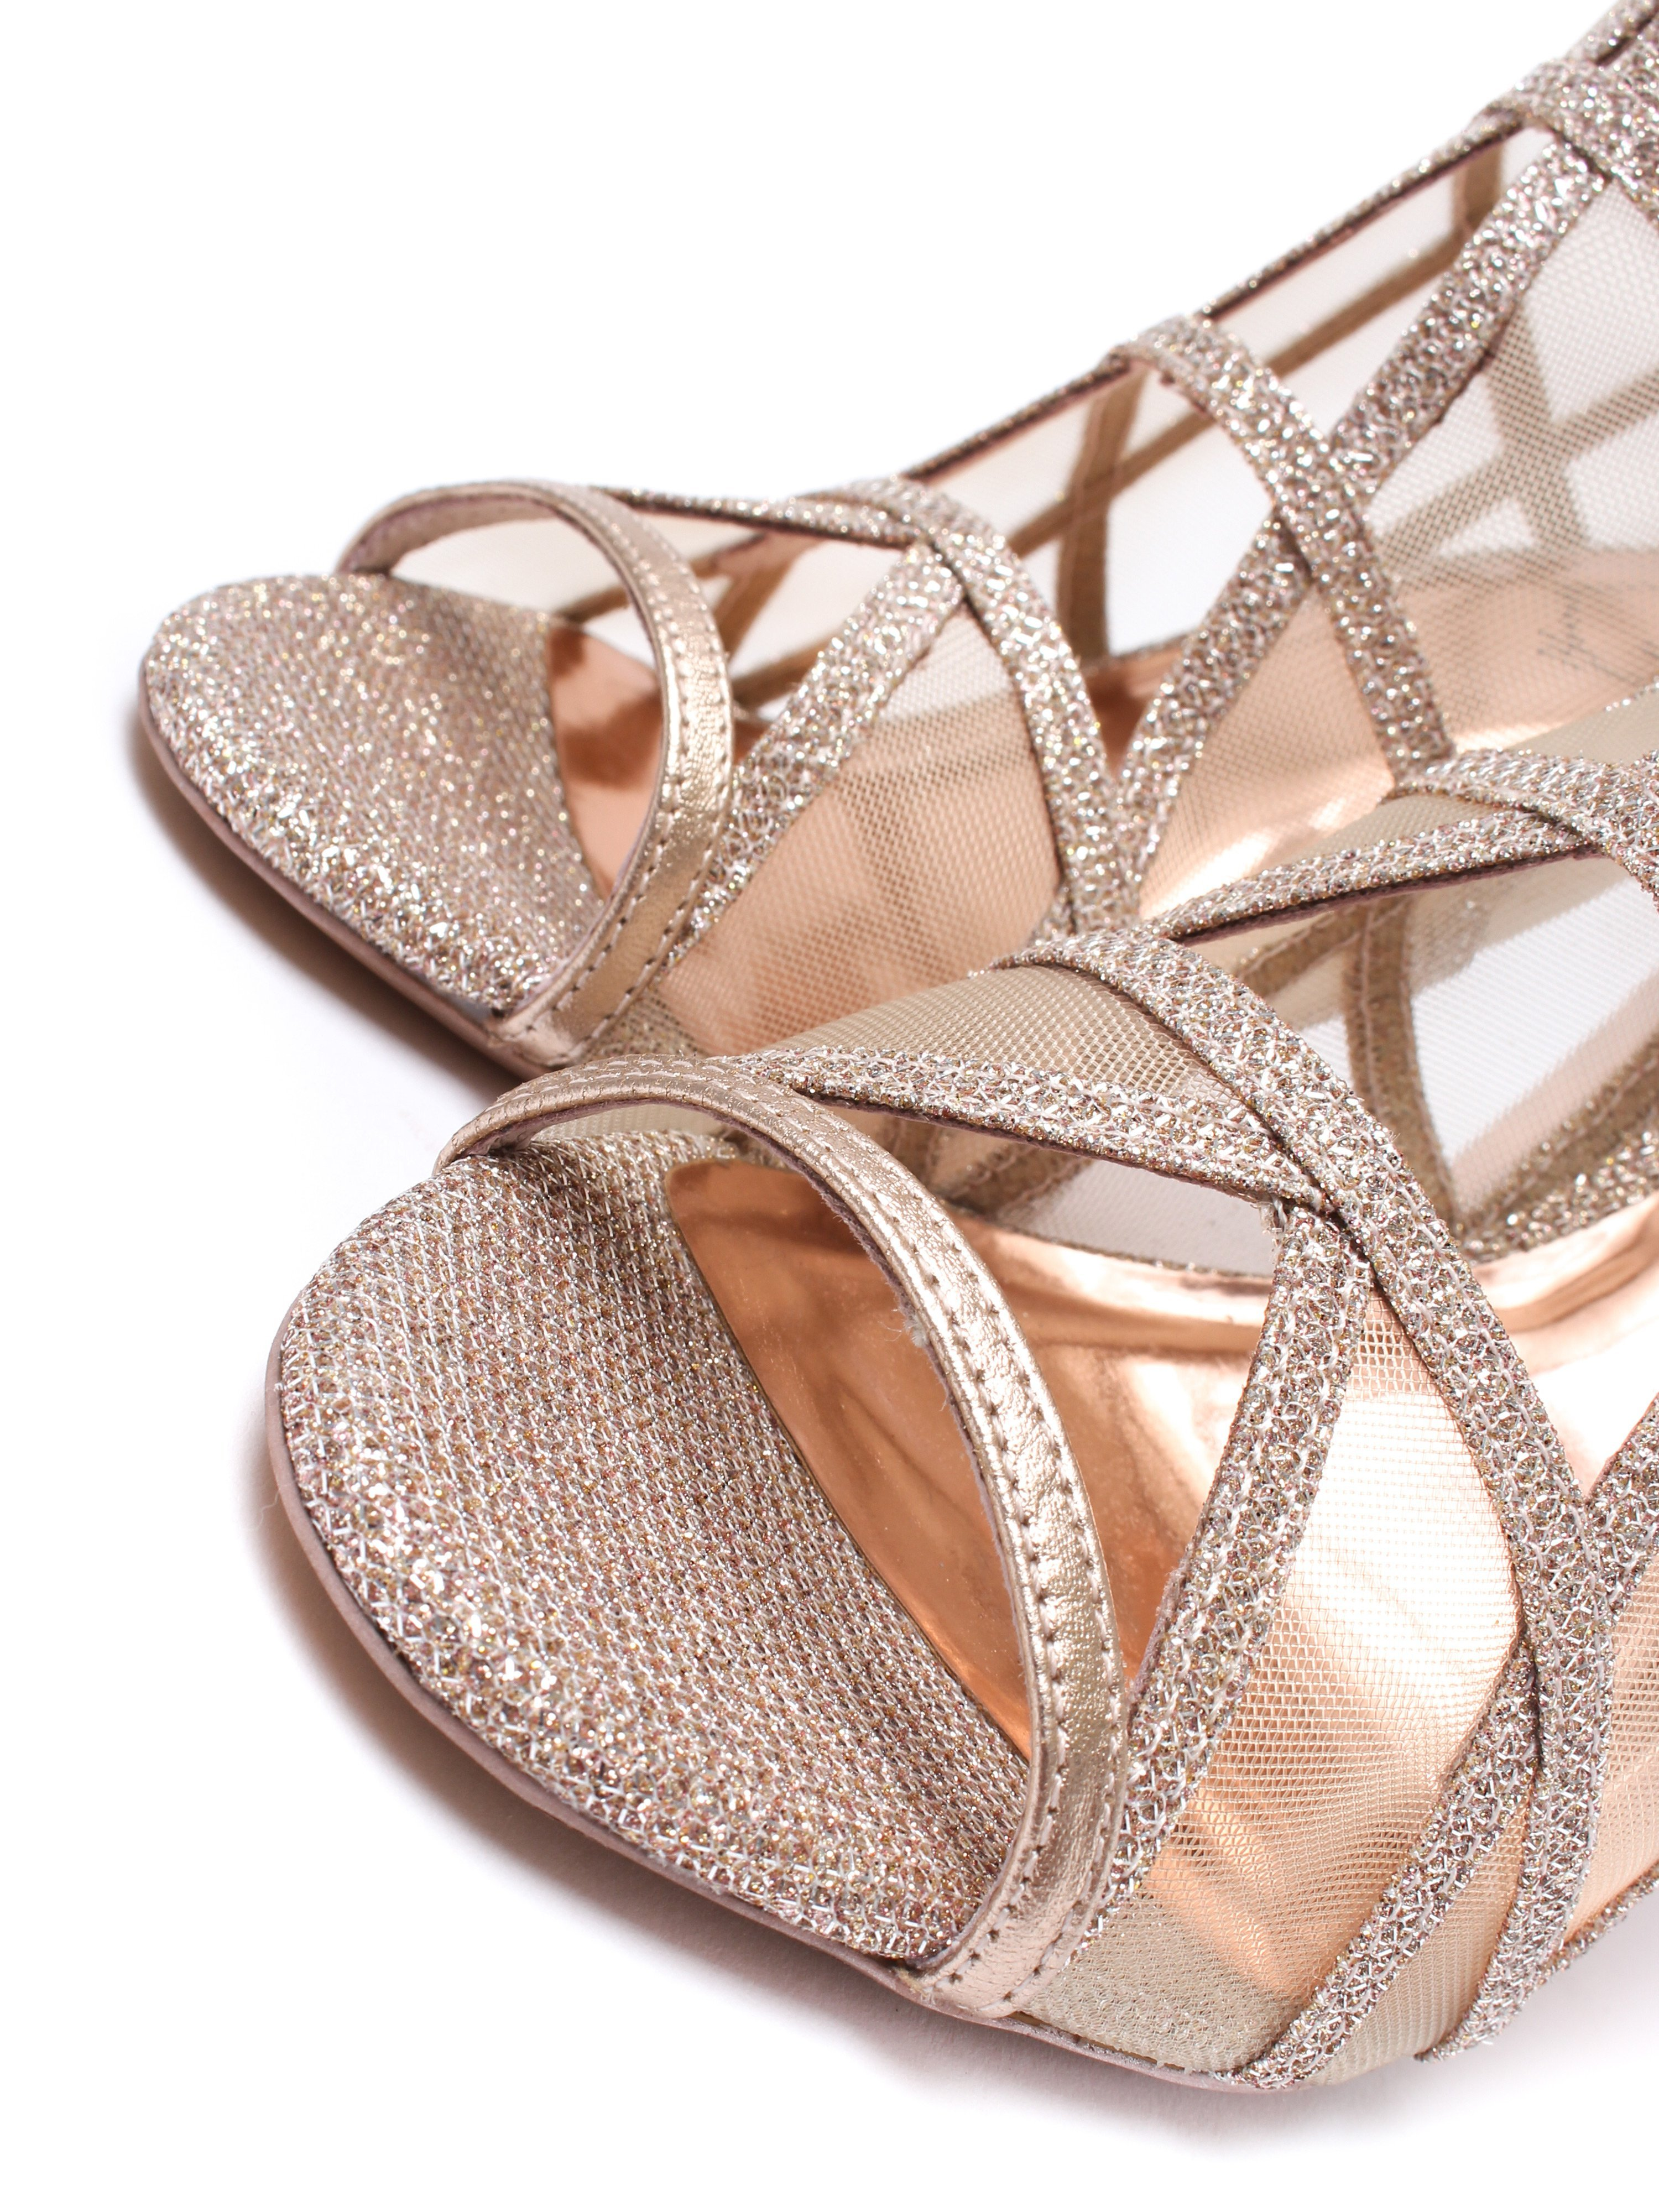 Ted Baker Women's Xstal Peep Toe Heels - Rose Gold